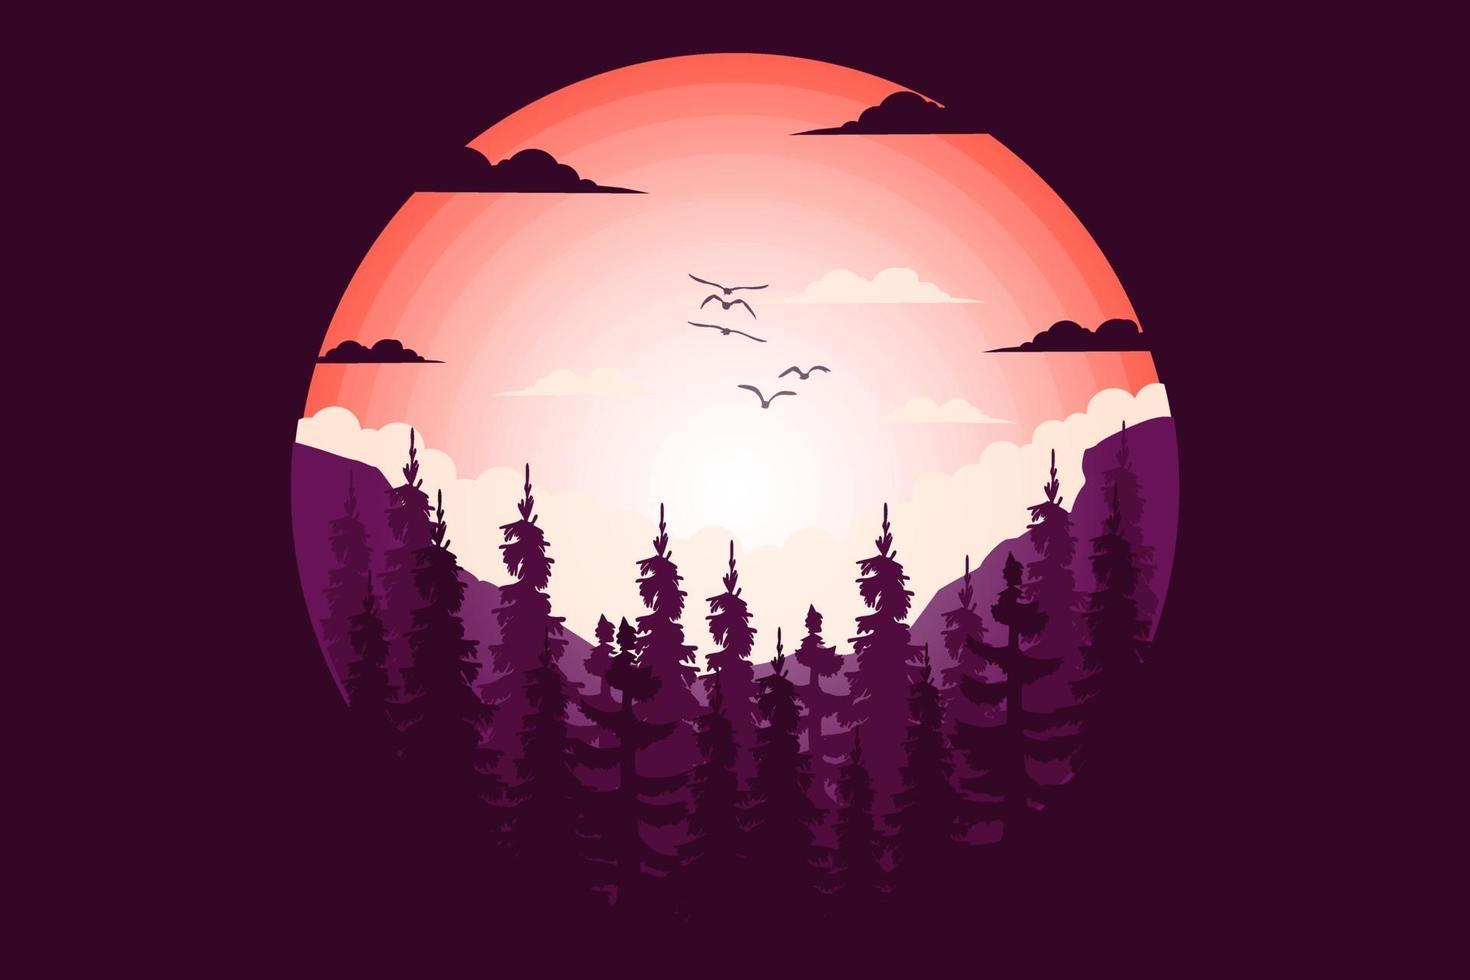 T-shirt pine tree mountain nature beautiful flat style illustration vector